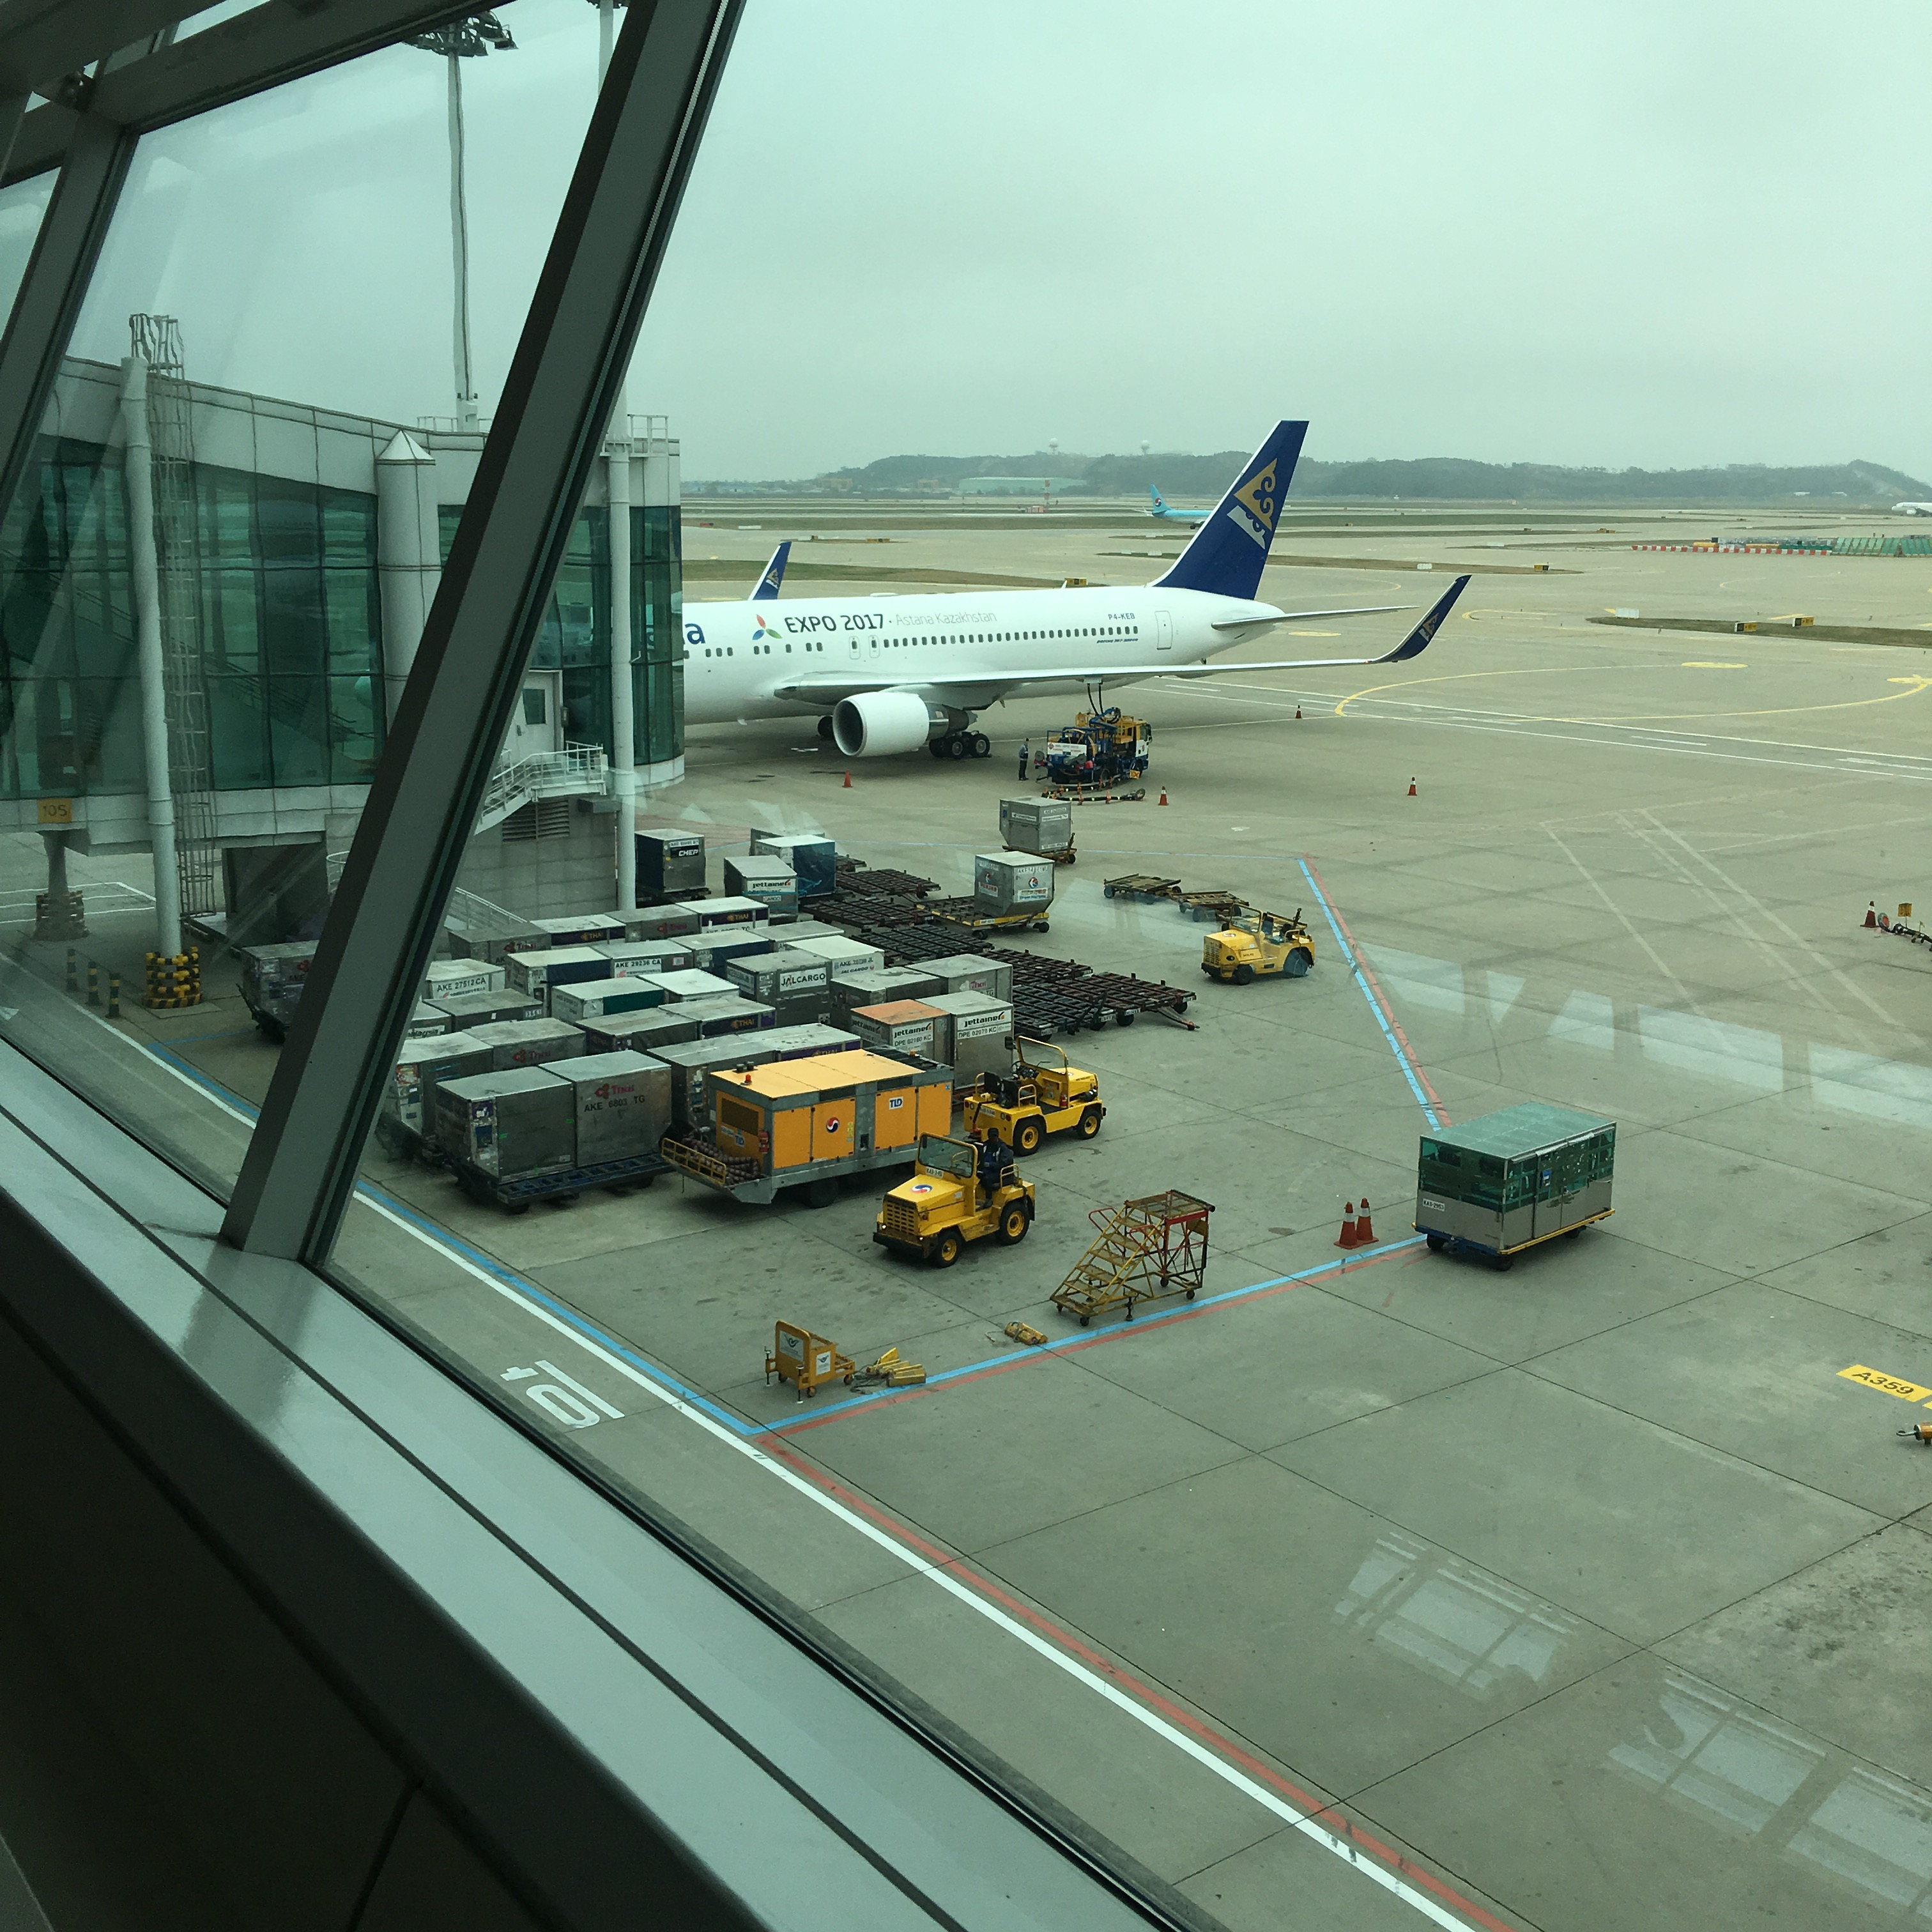 Air Astana in Seoul, South Korea.